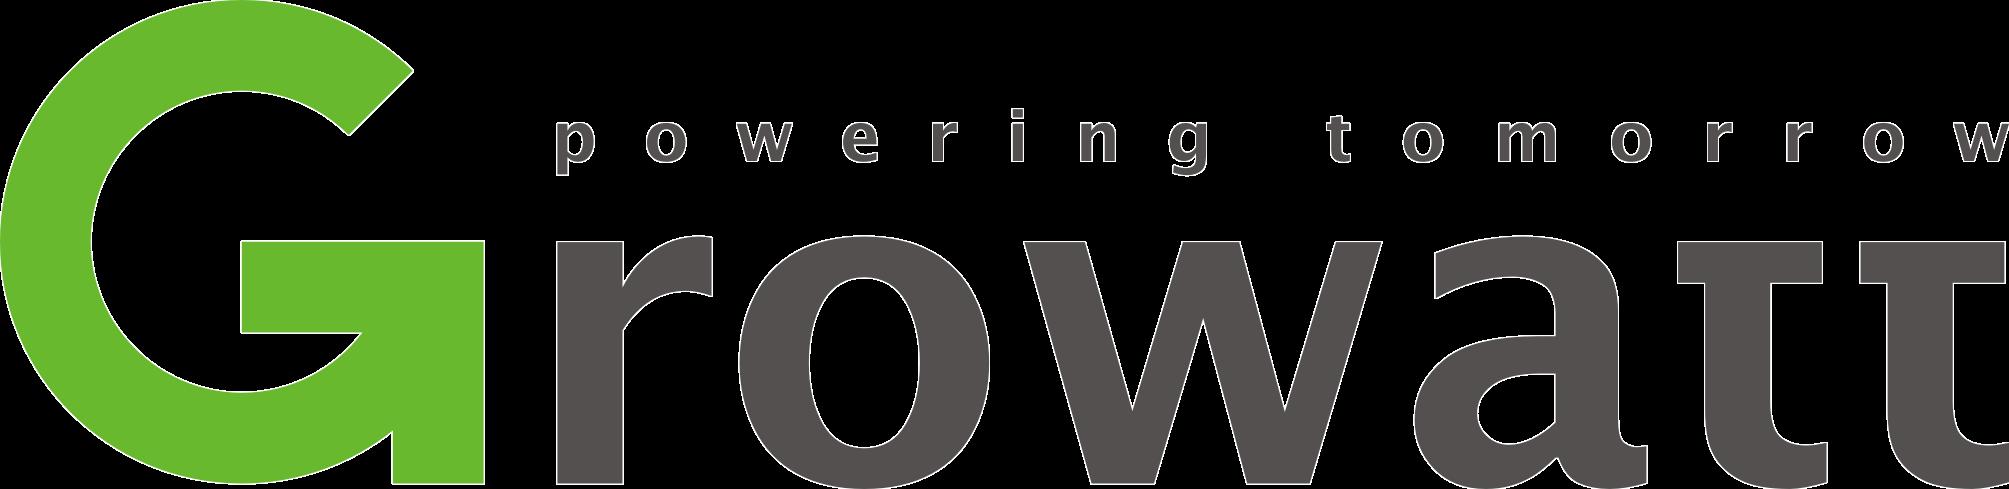 Growatt-logo-PNG_edited.png